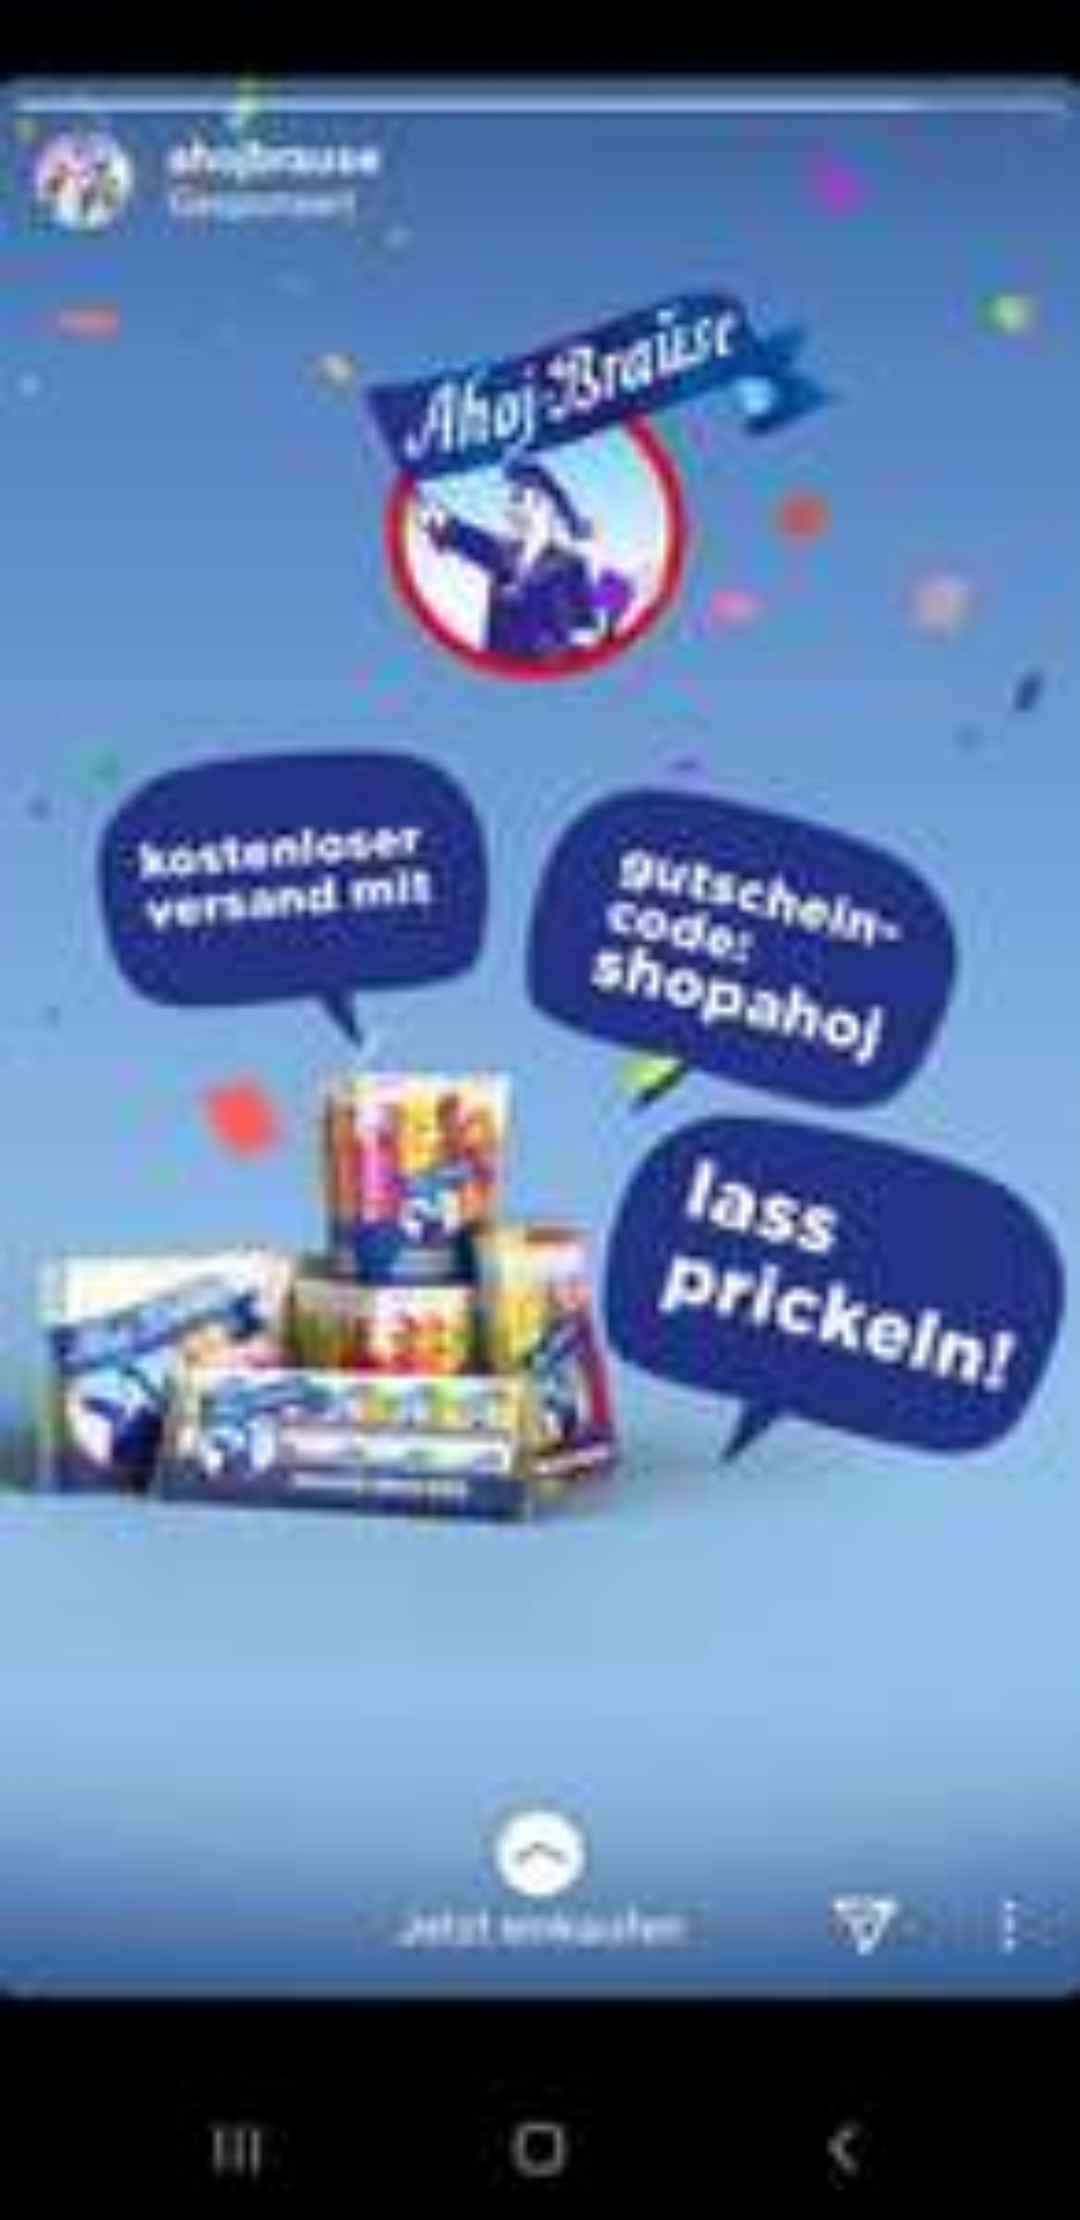 Ahoj Brause Neuer Shop Gratis Versand (MBW 5 Euro)